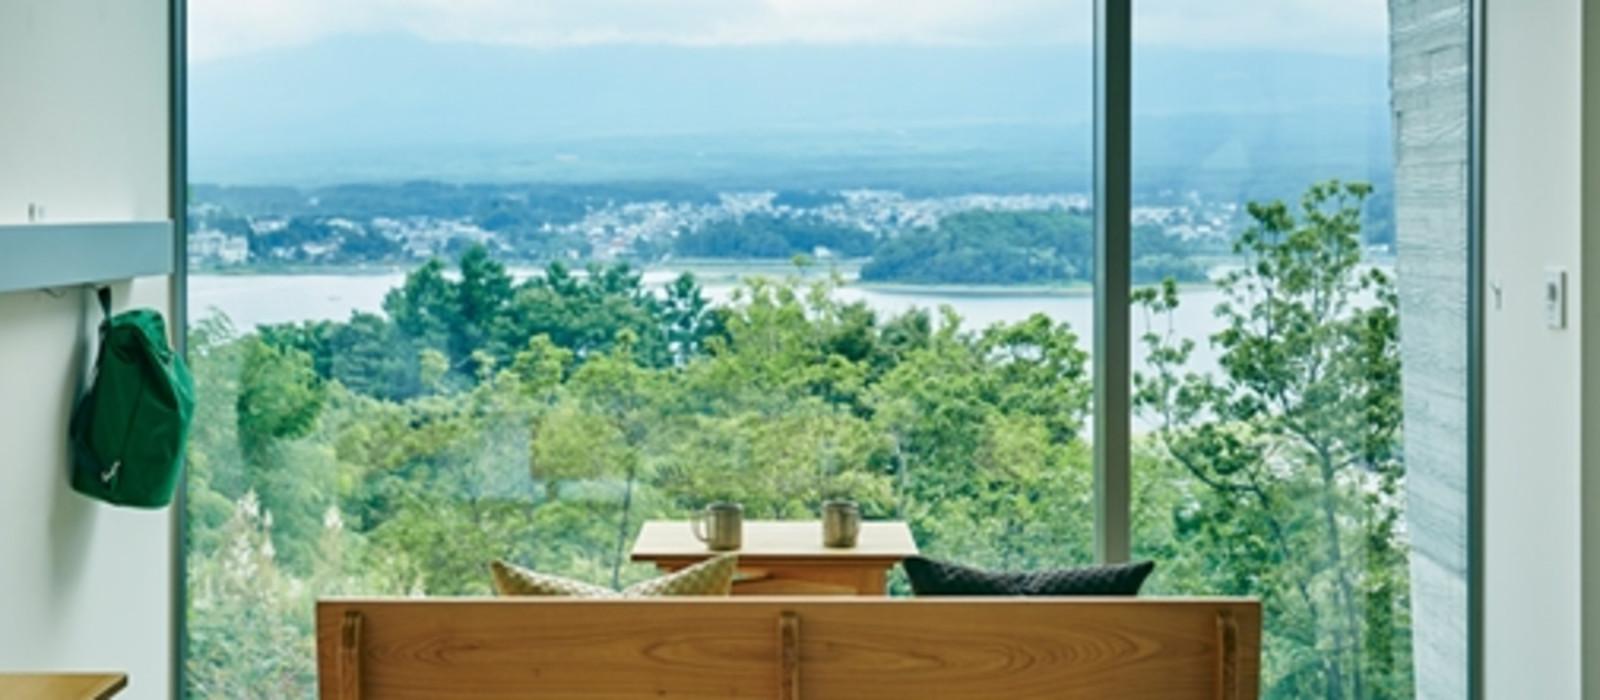 Hotel Hoshinoya Fuji Japan